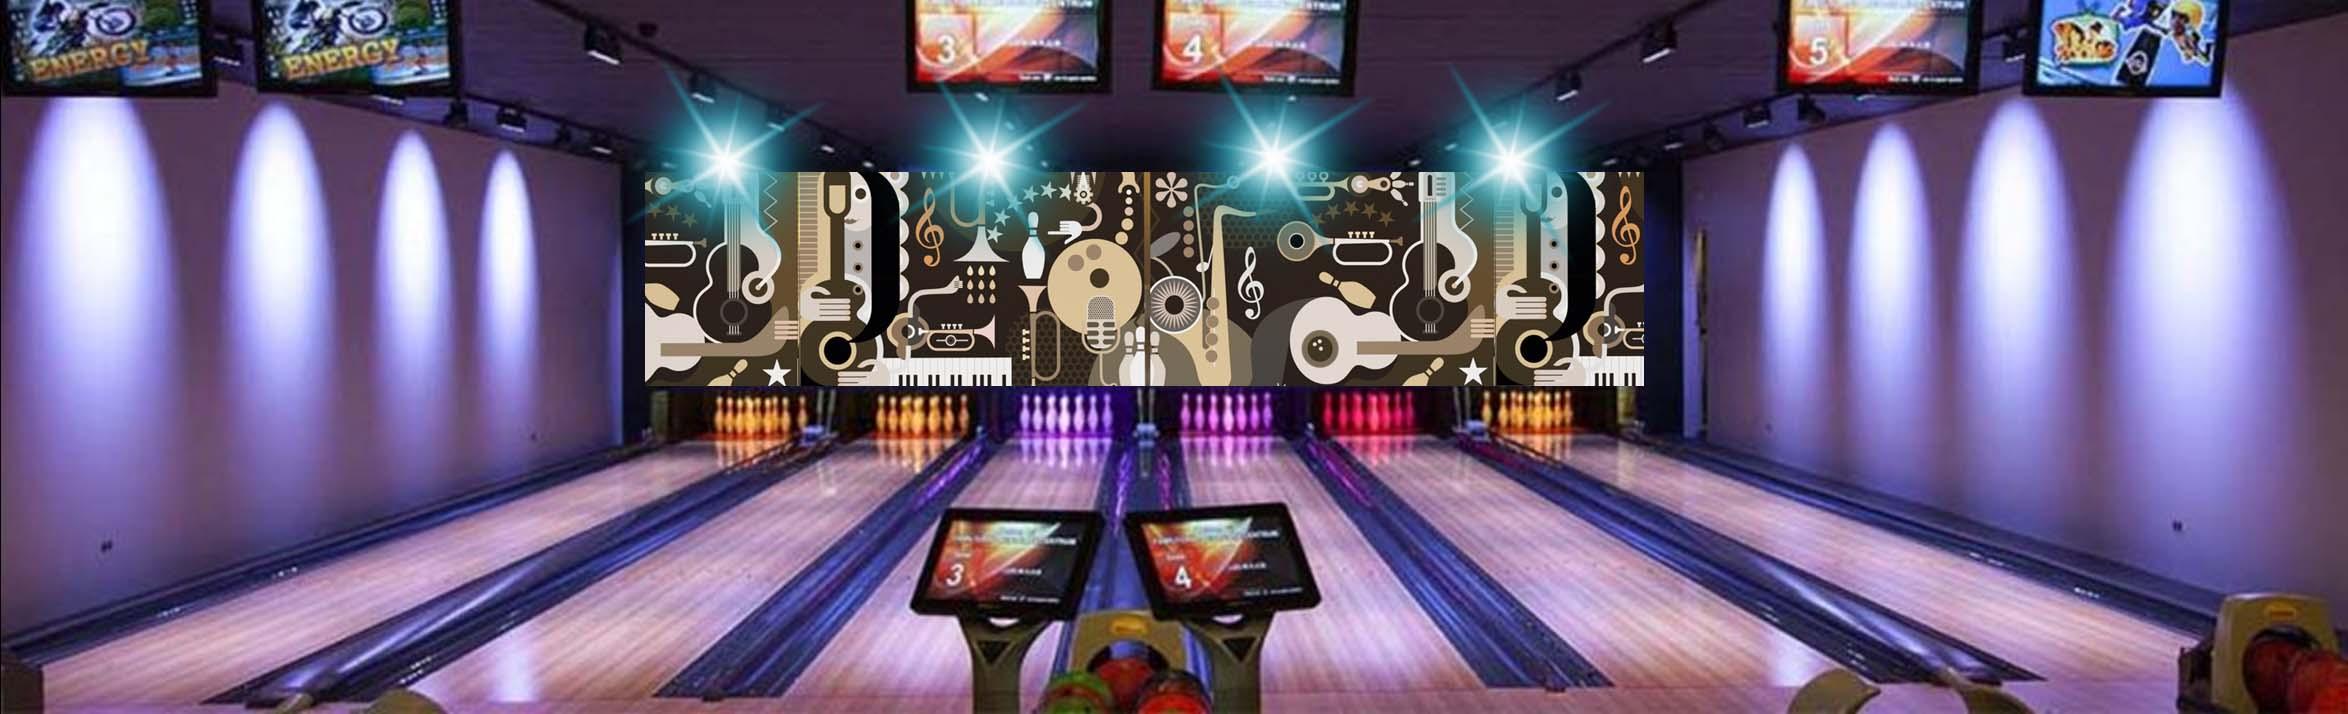 bowling tijden